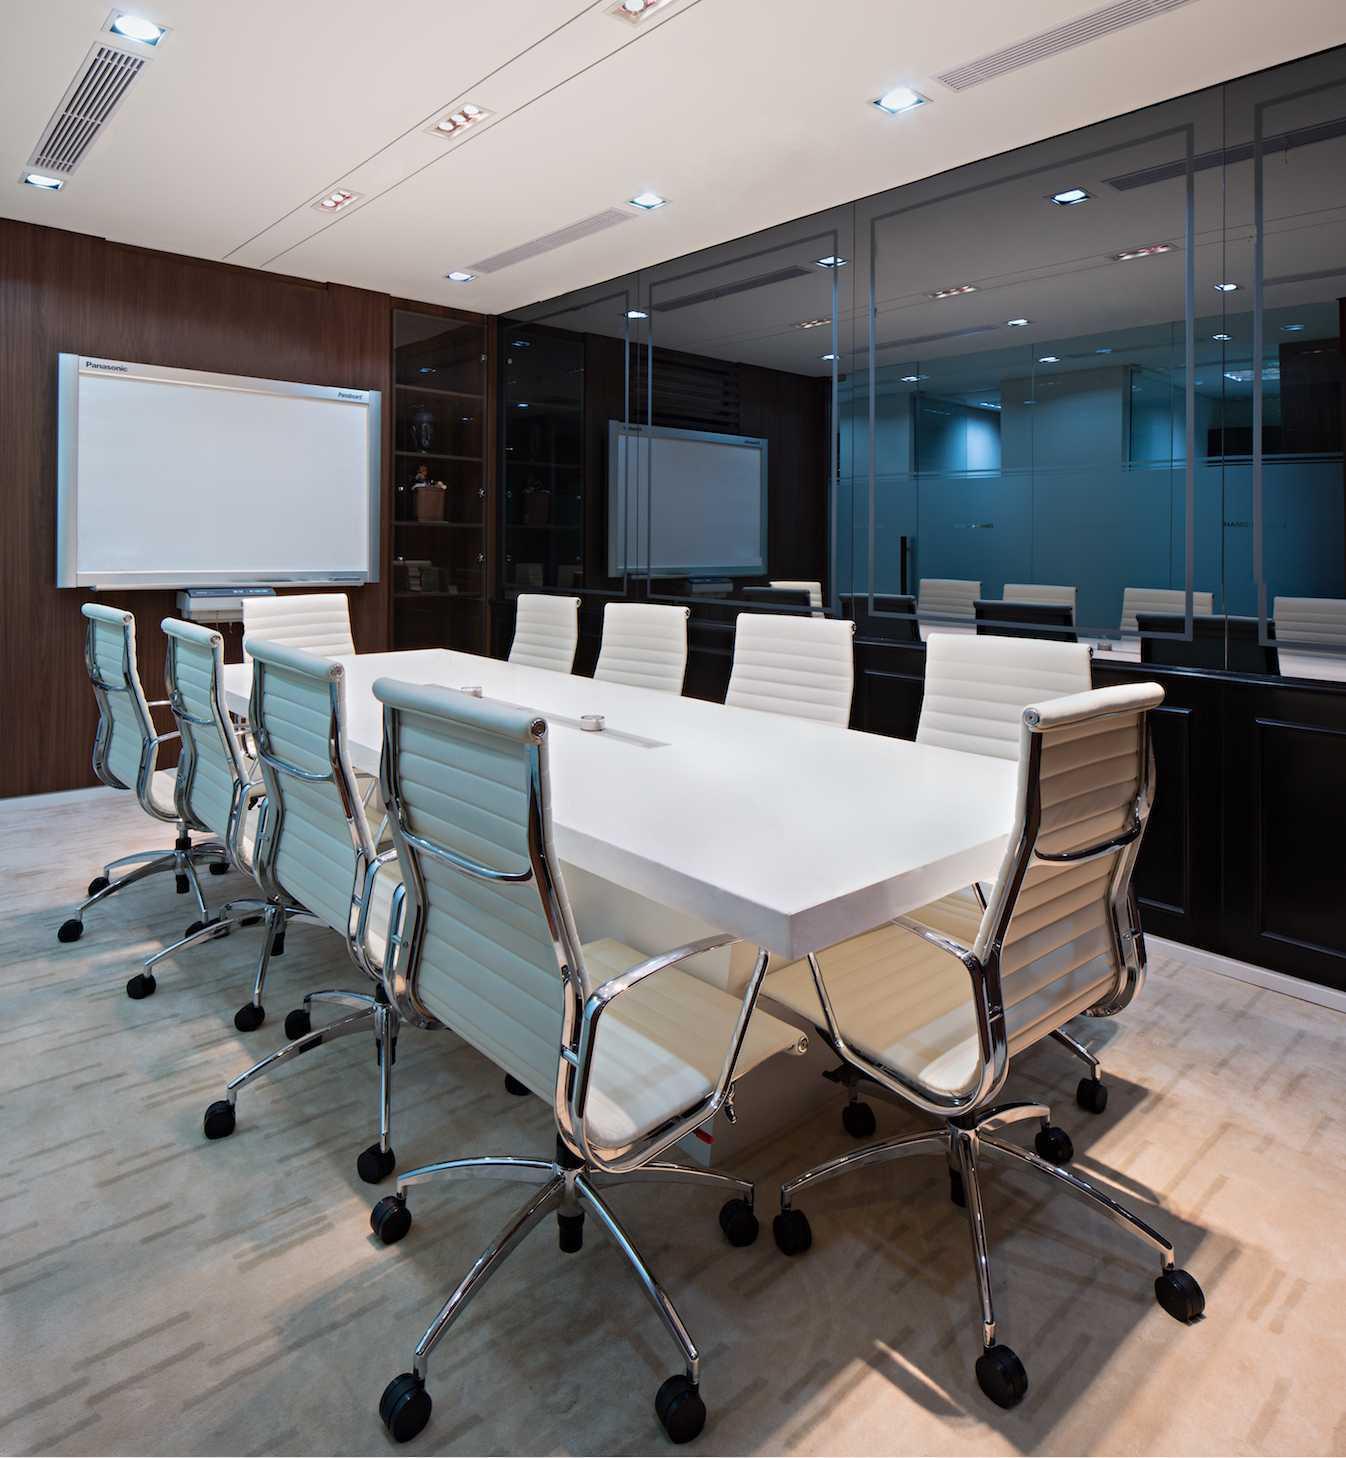 Pt Asa Adiguna Hanis & Hanis Advocate Sarinah Building Sarinah Building Meeting Room Minimalis  24577